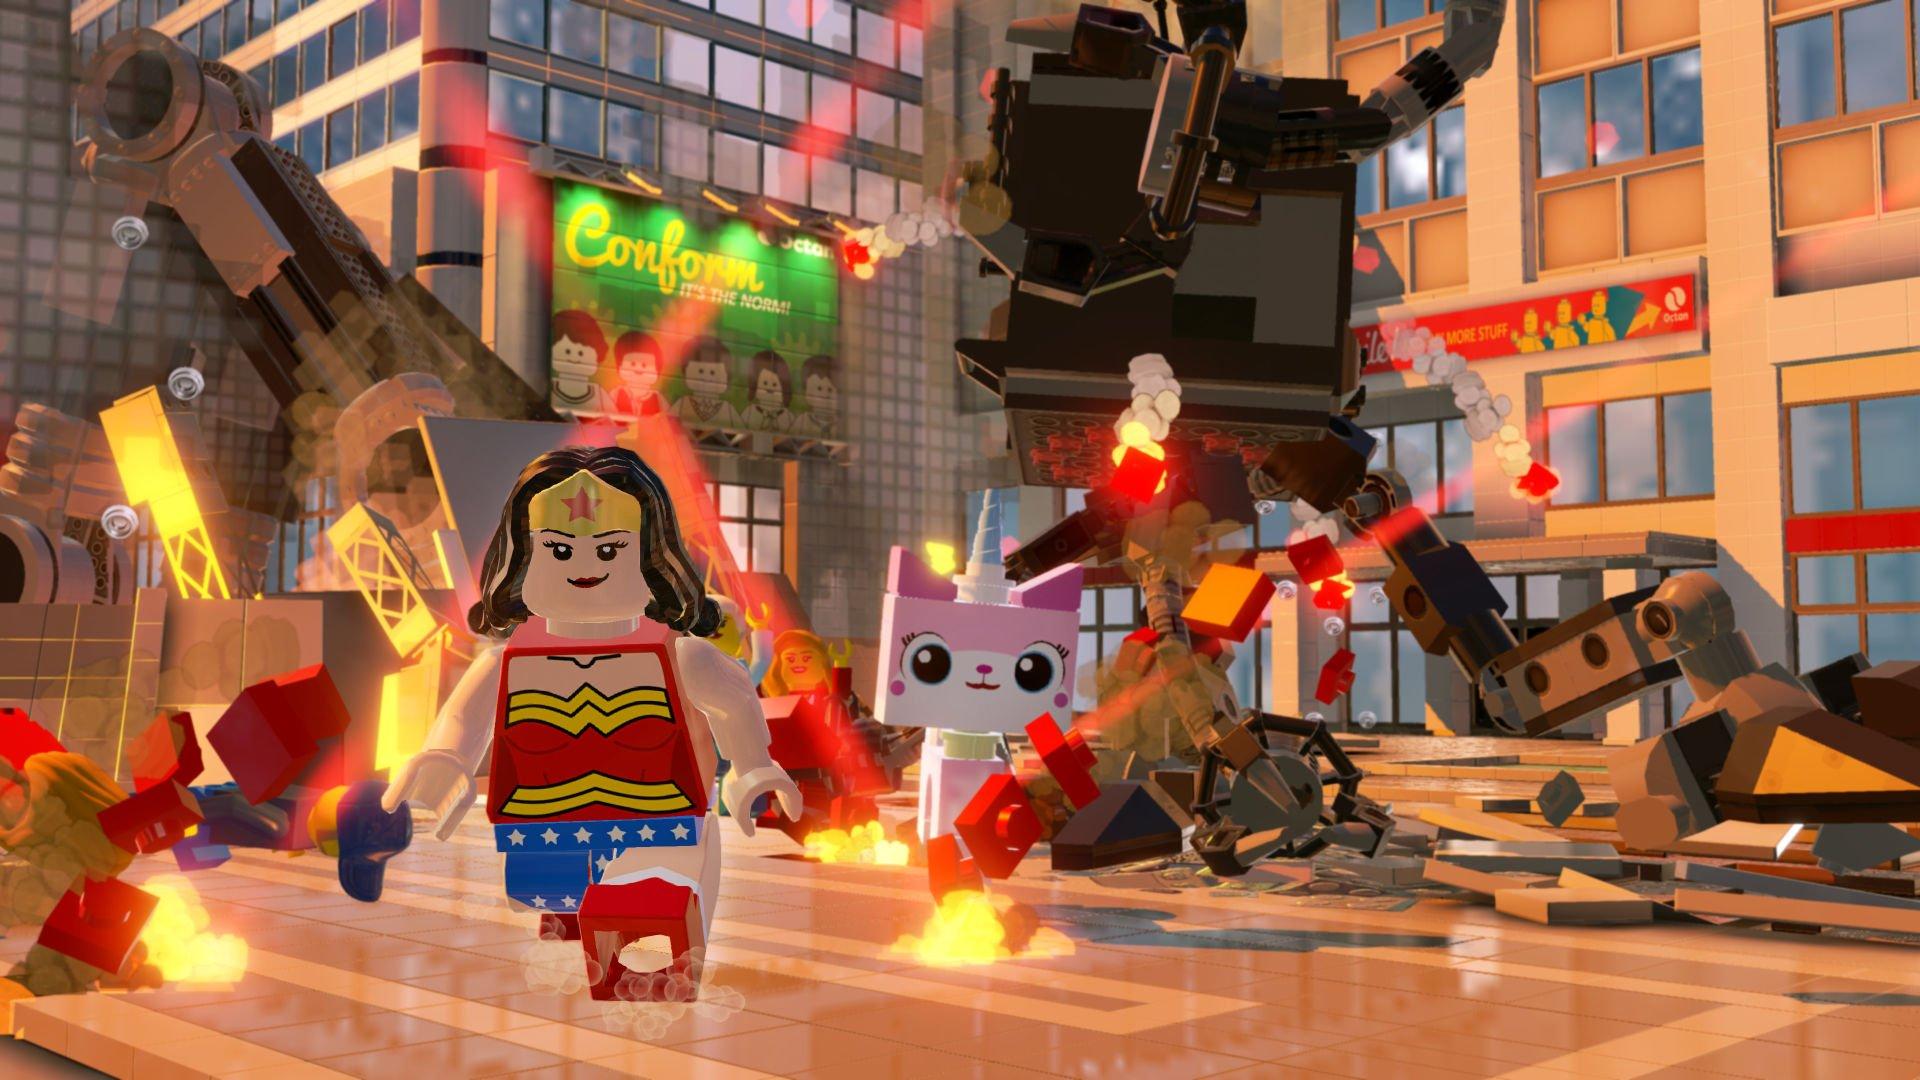 LEGO Movie The Videogame Para PC 3DJuegos